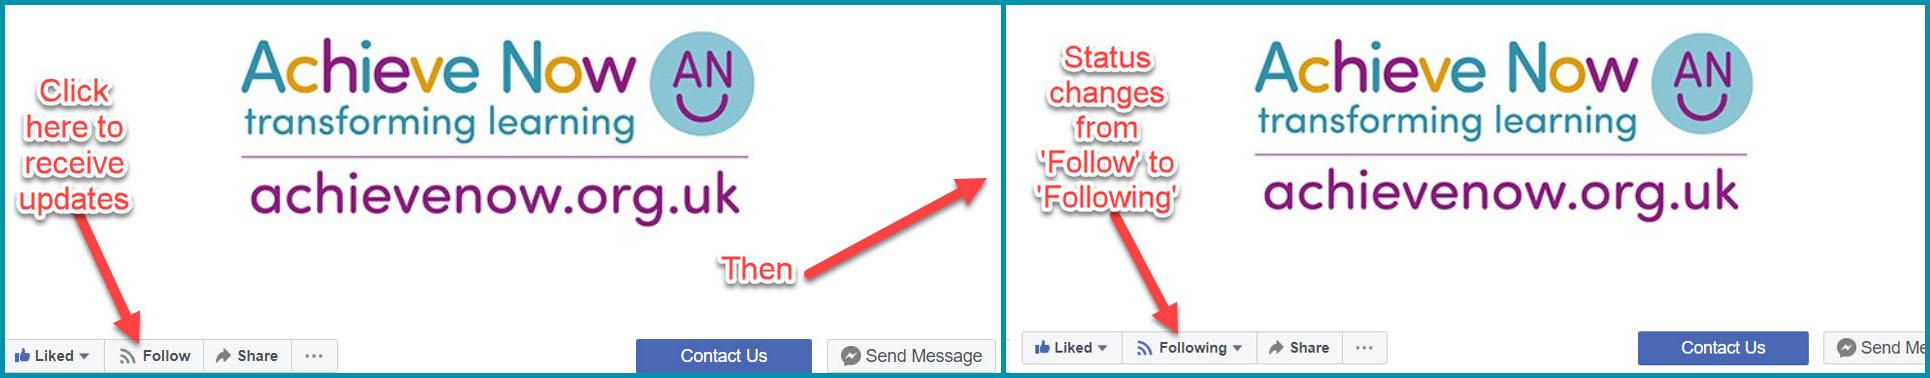 Intructions to follow on Facebook.jpg